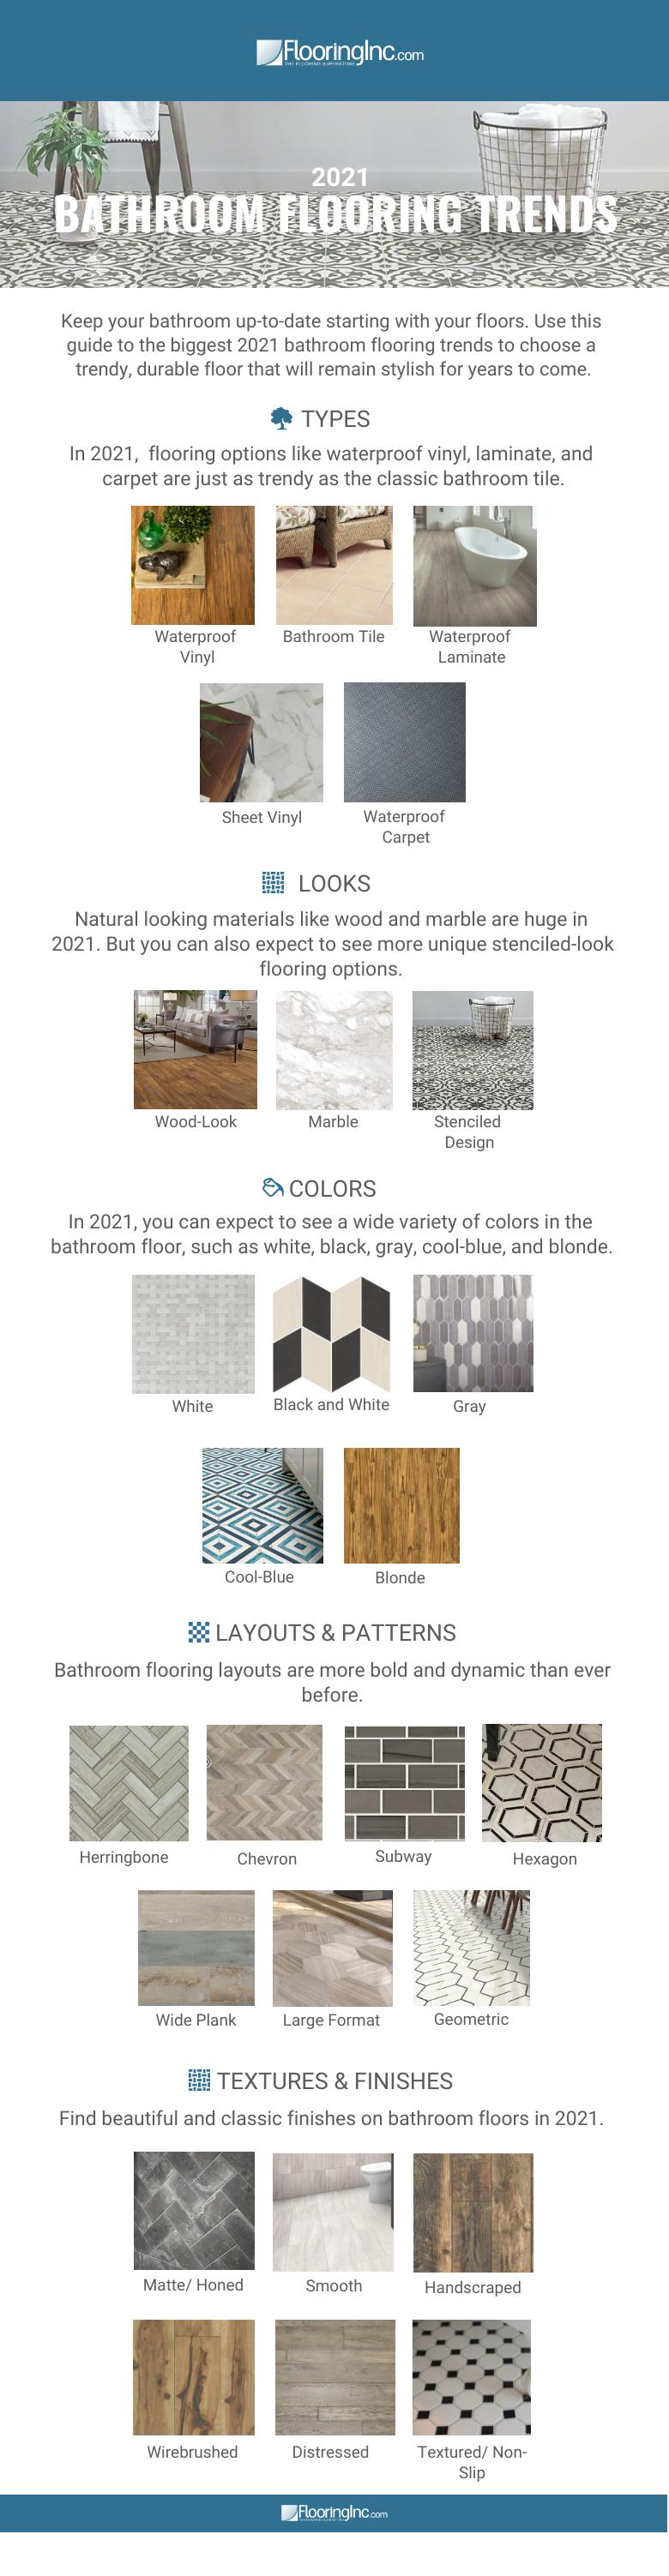 Bathroom Flooring Trends